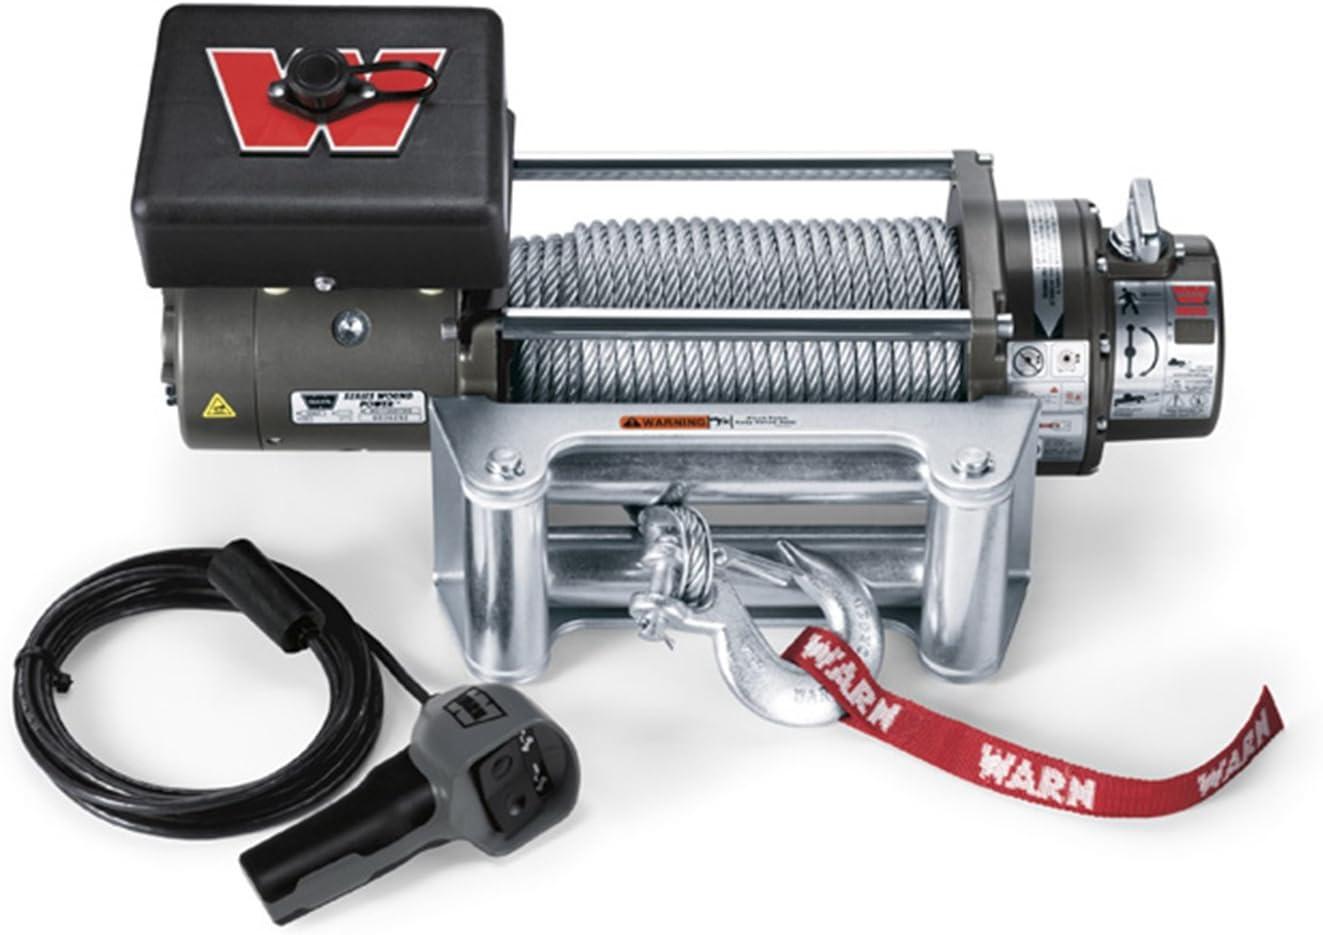 WARN M8000 8000-lb. Winch